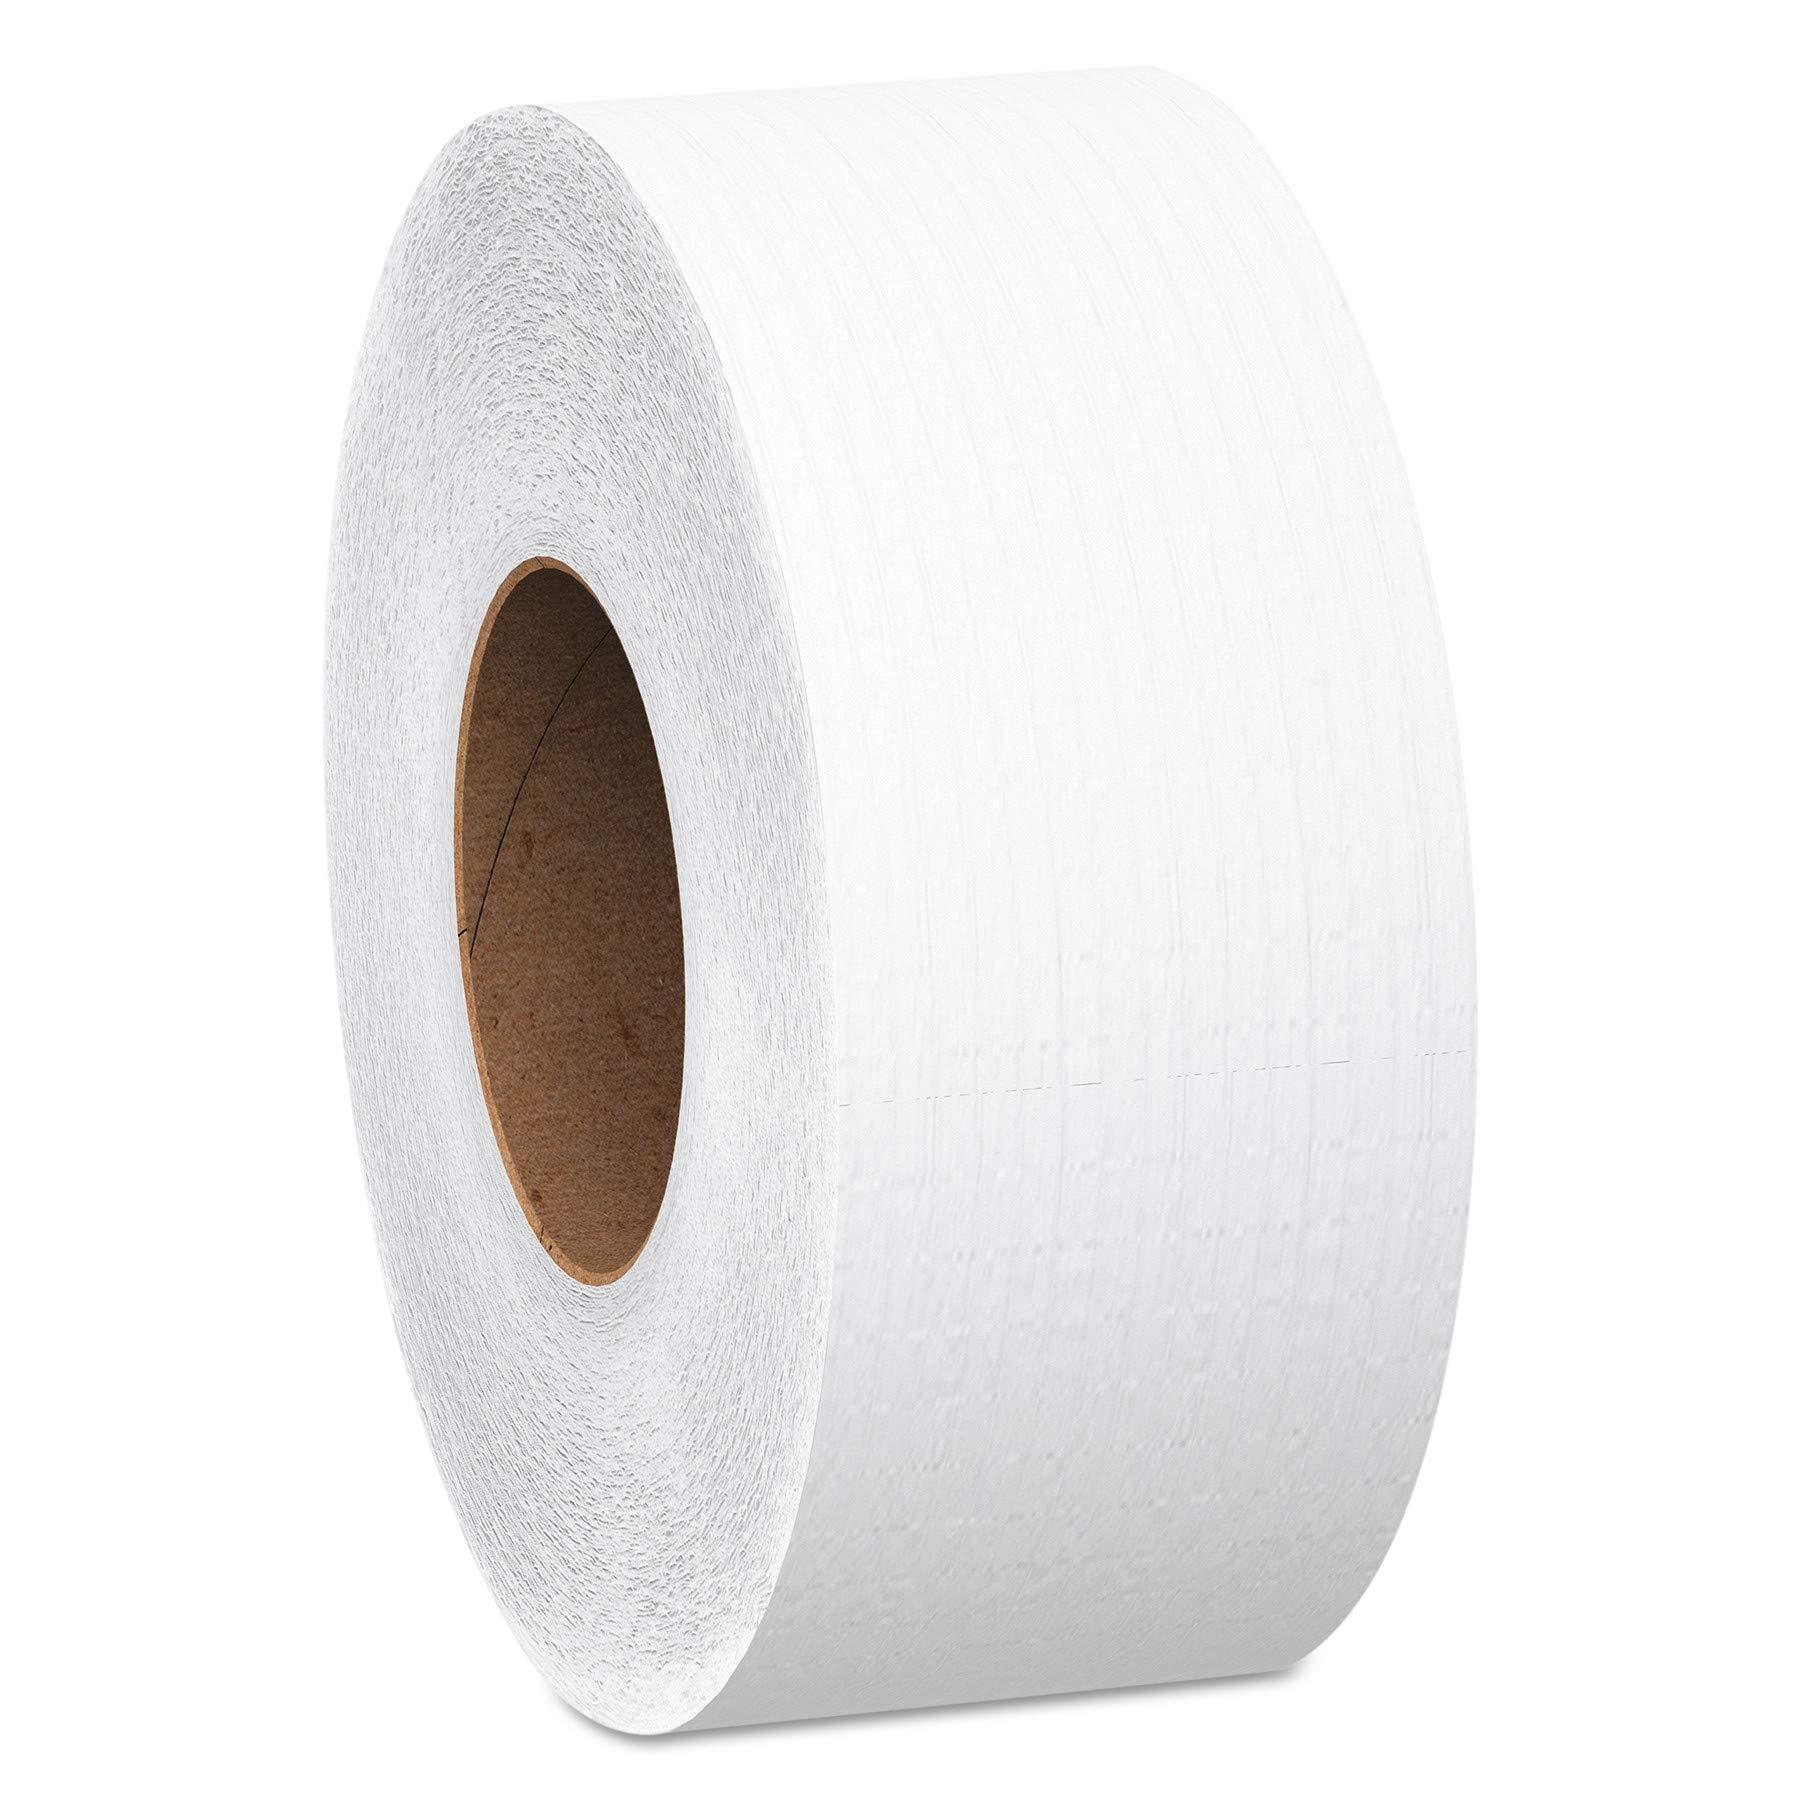 Scott UUBVZJLA Essential Jumbo Roll JR. Commercial Toilet Paper (07805), 2-PLY, White, 1000' / Roll, 2 Case of 12 Rolls by Scott (Image #2)